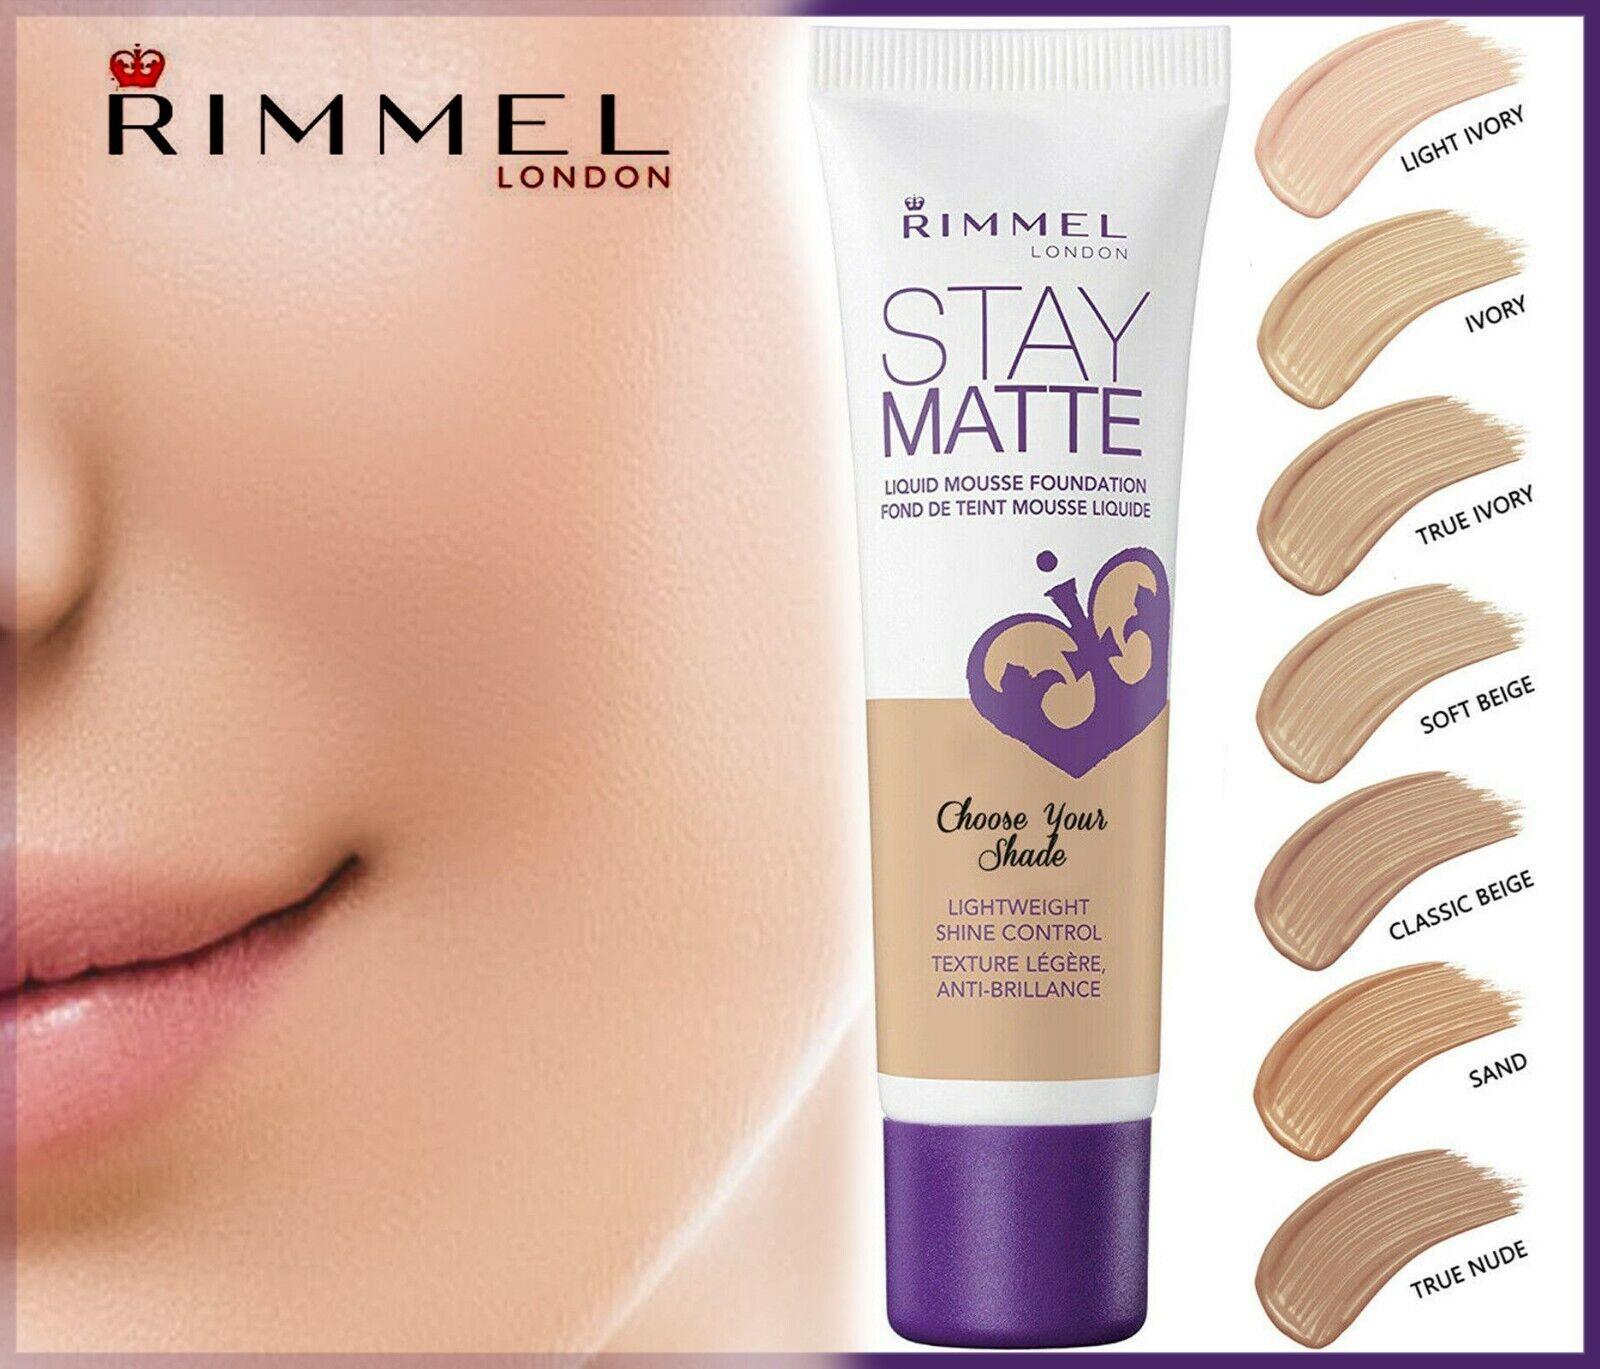 Rimmel London Stay Matte Liquid Mousse Foundation 30ml Choose Your Shade Ebay